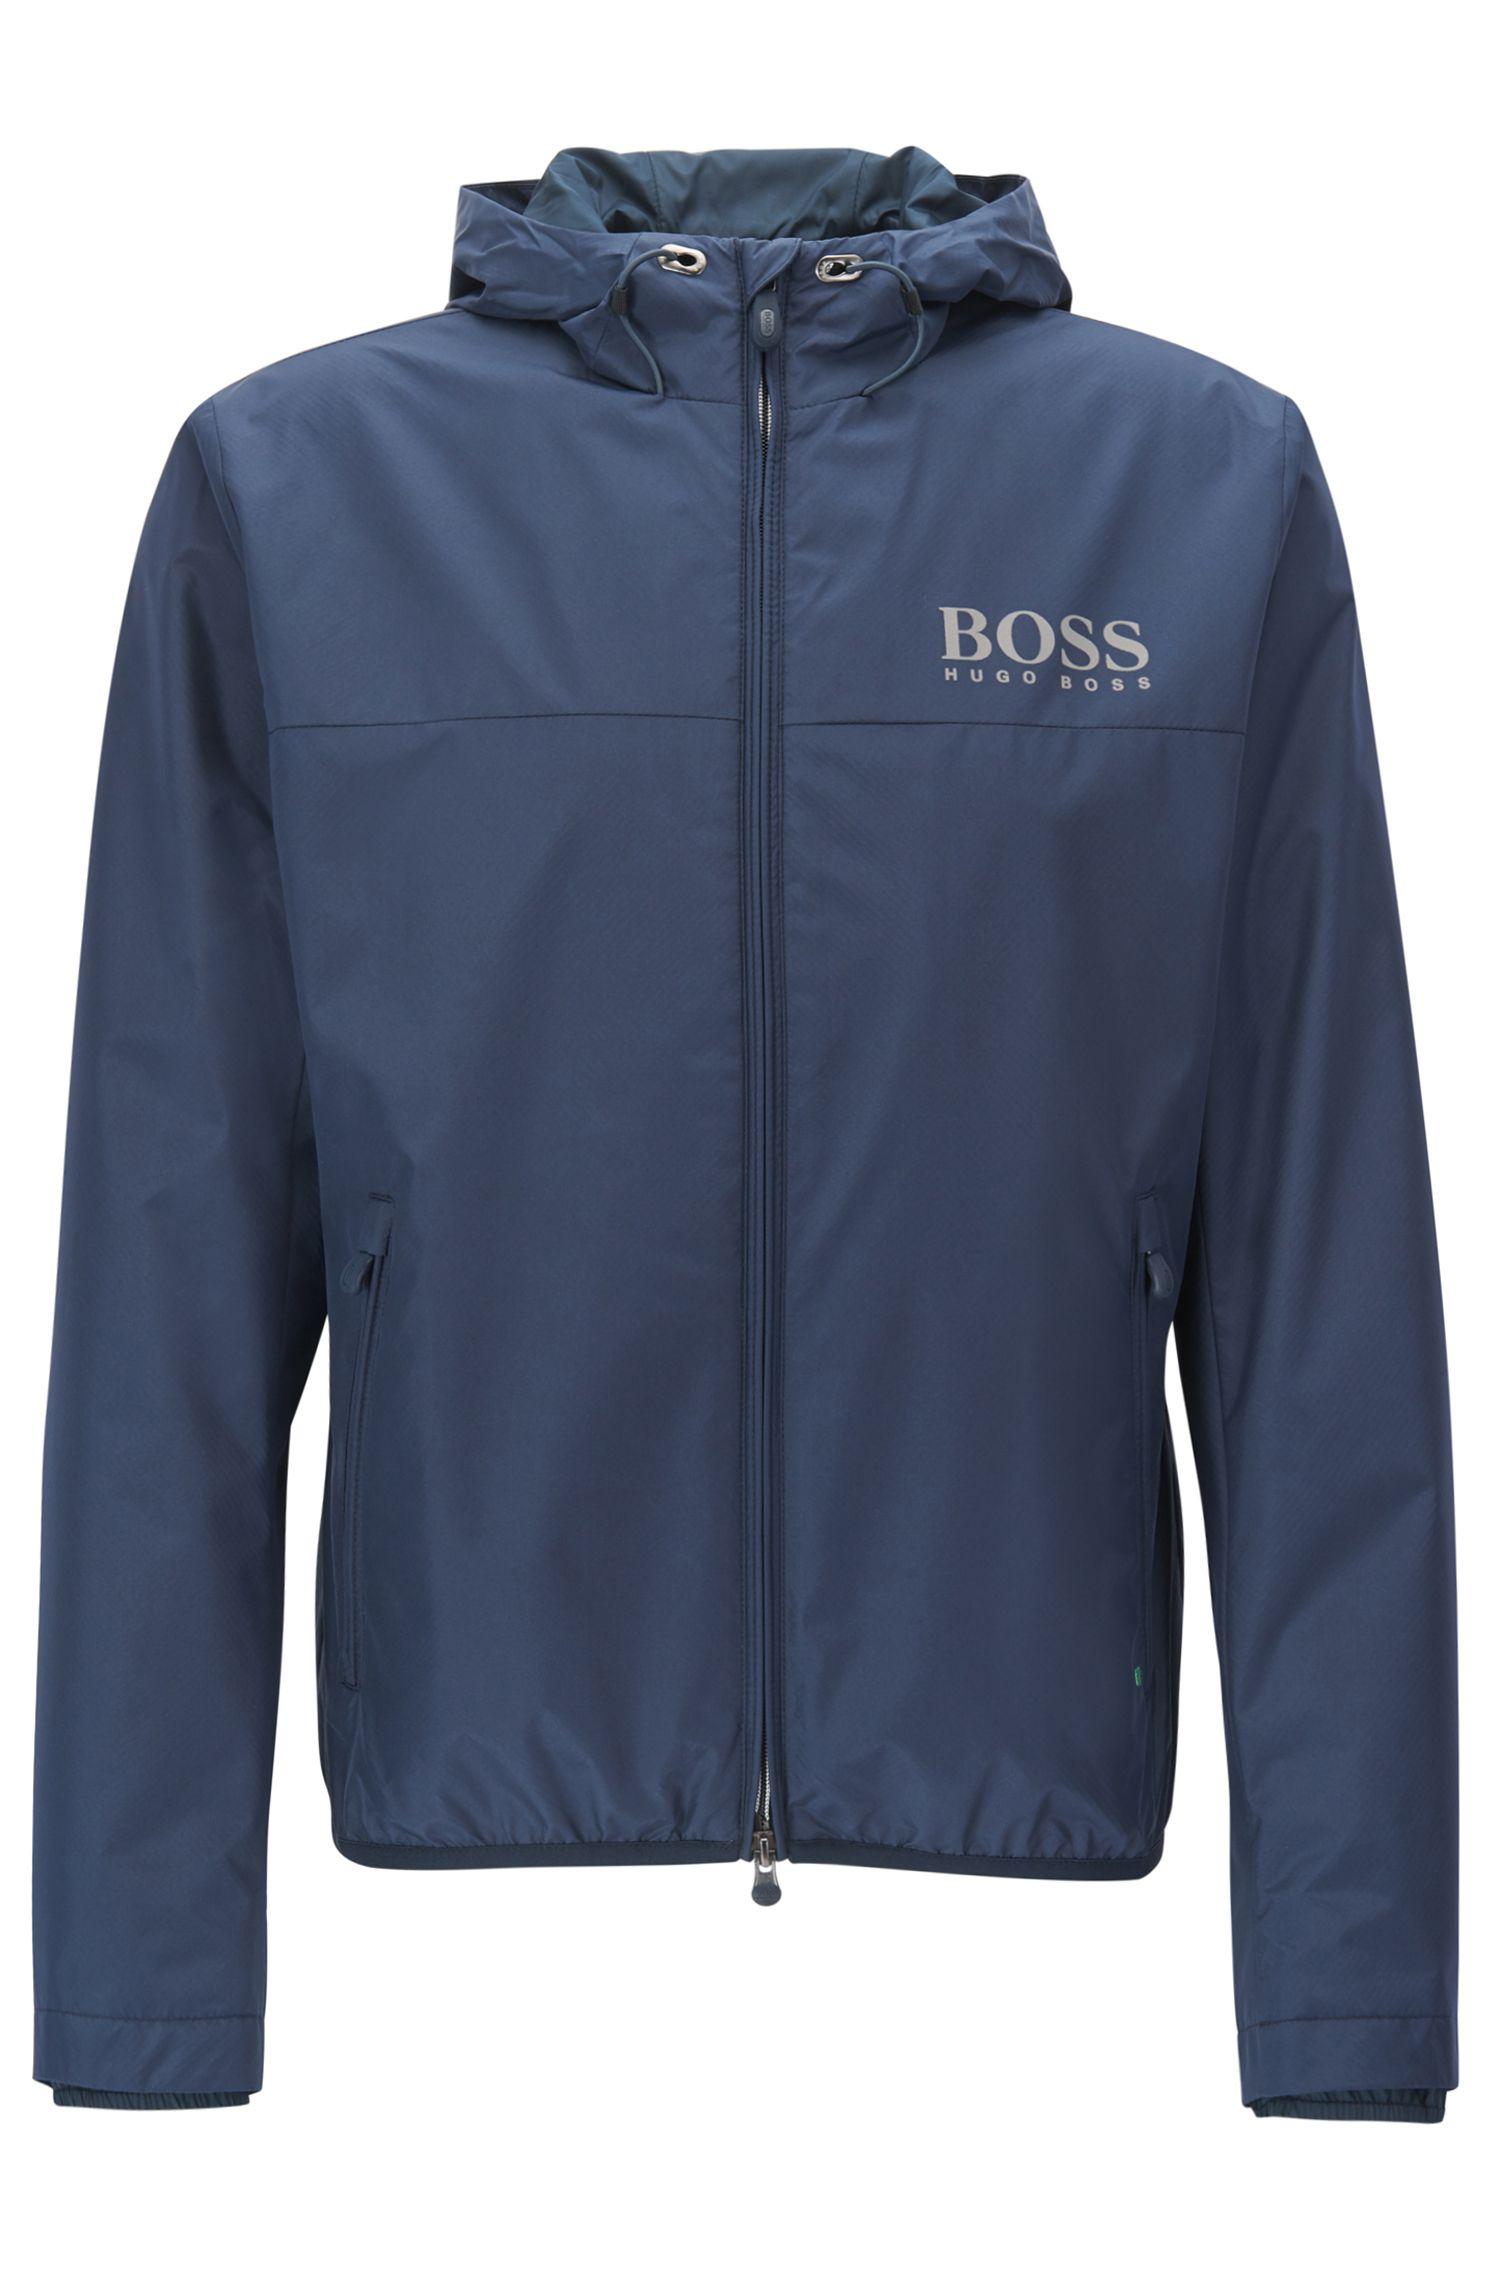 Regular-fit jas van technisch, waterafstotend materiaal